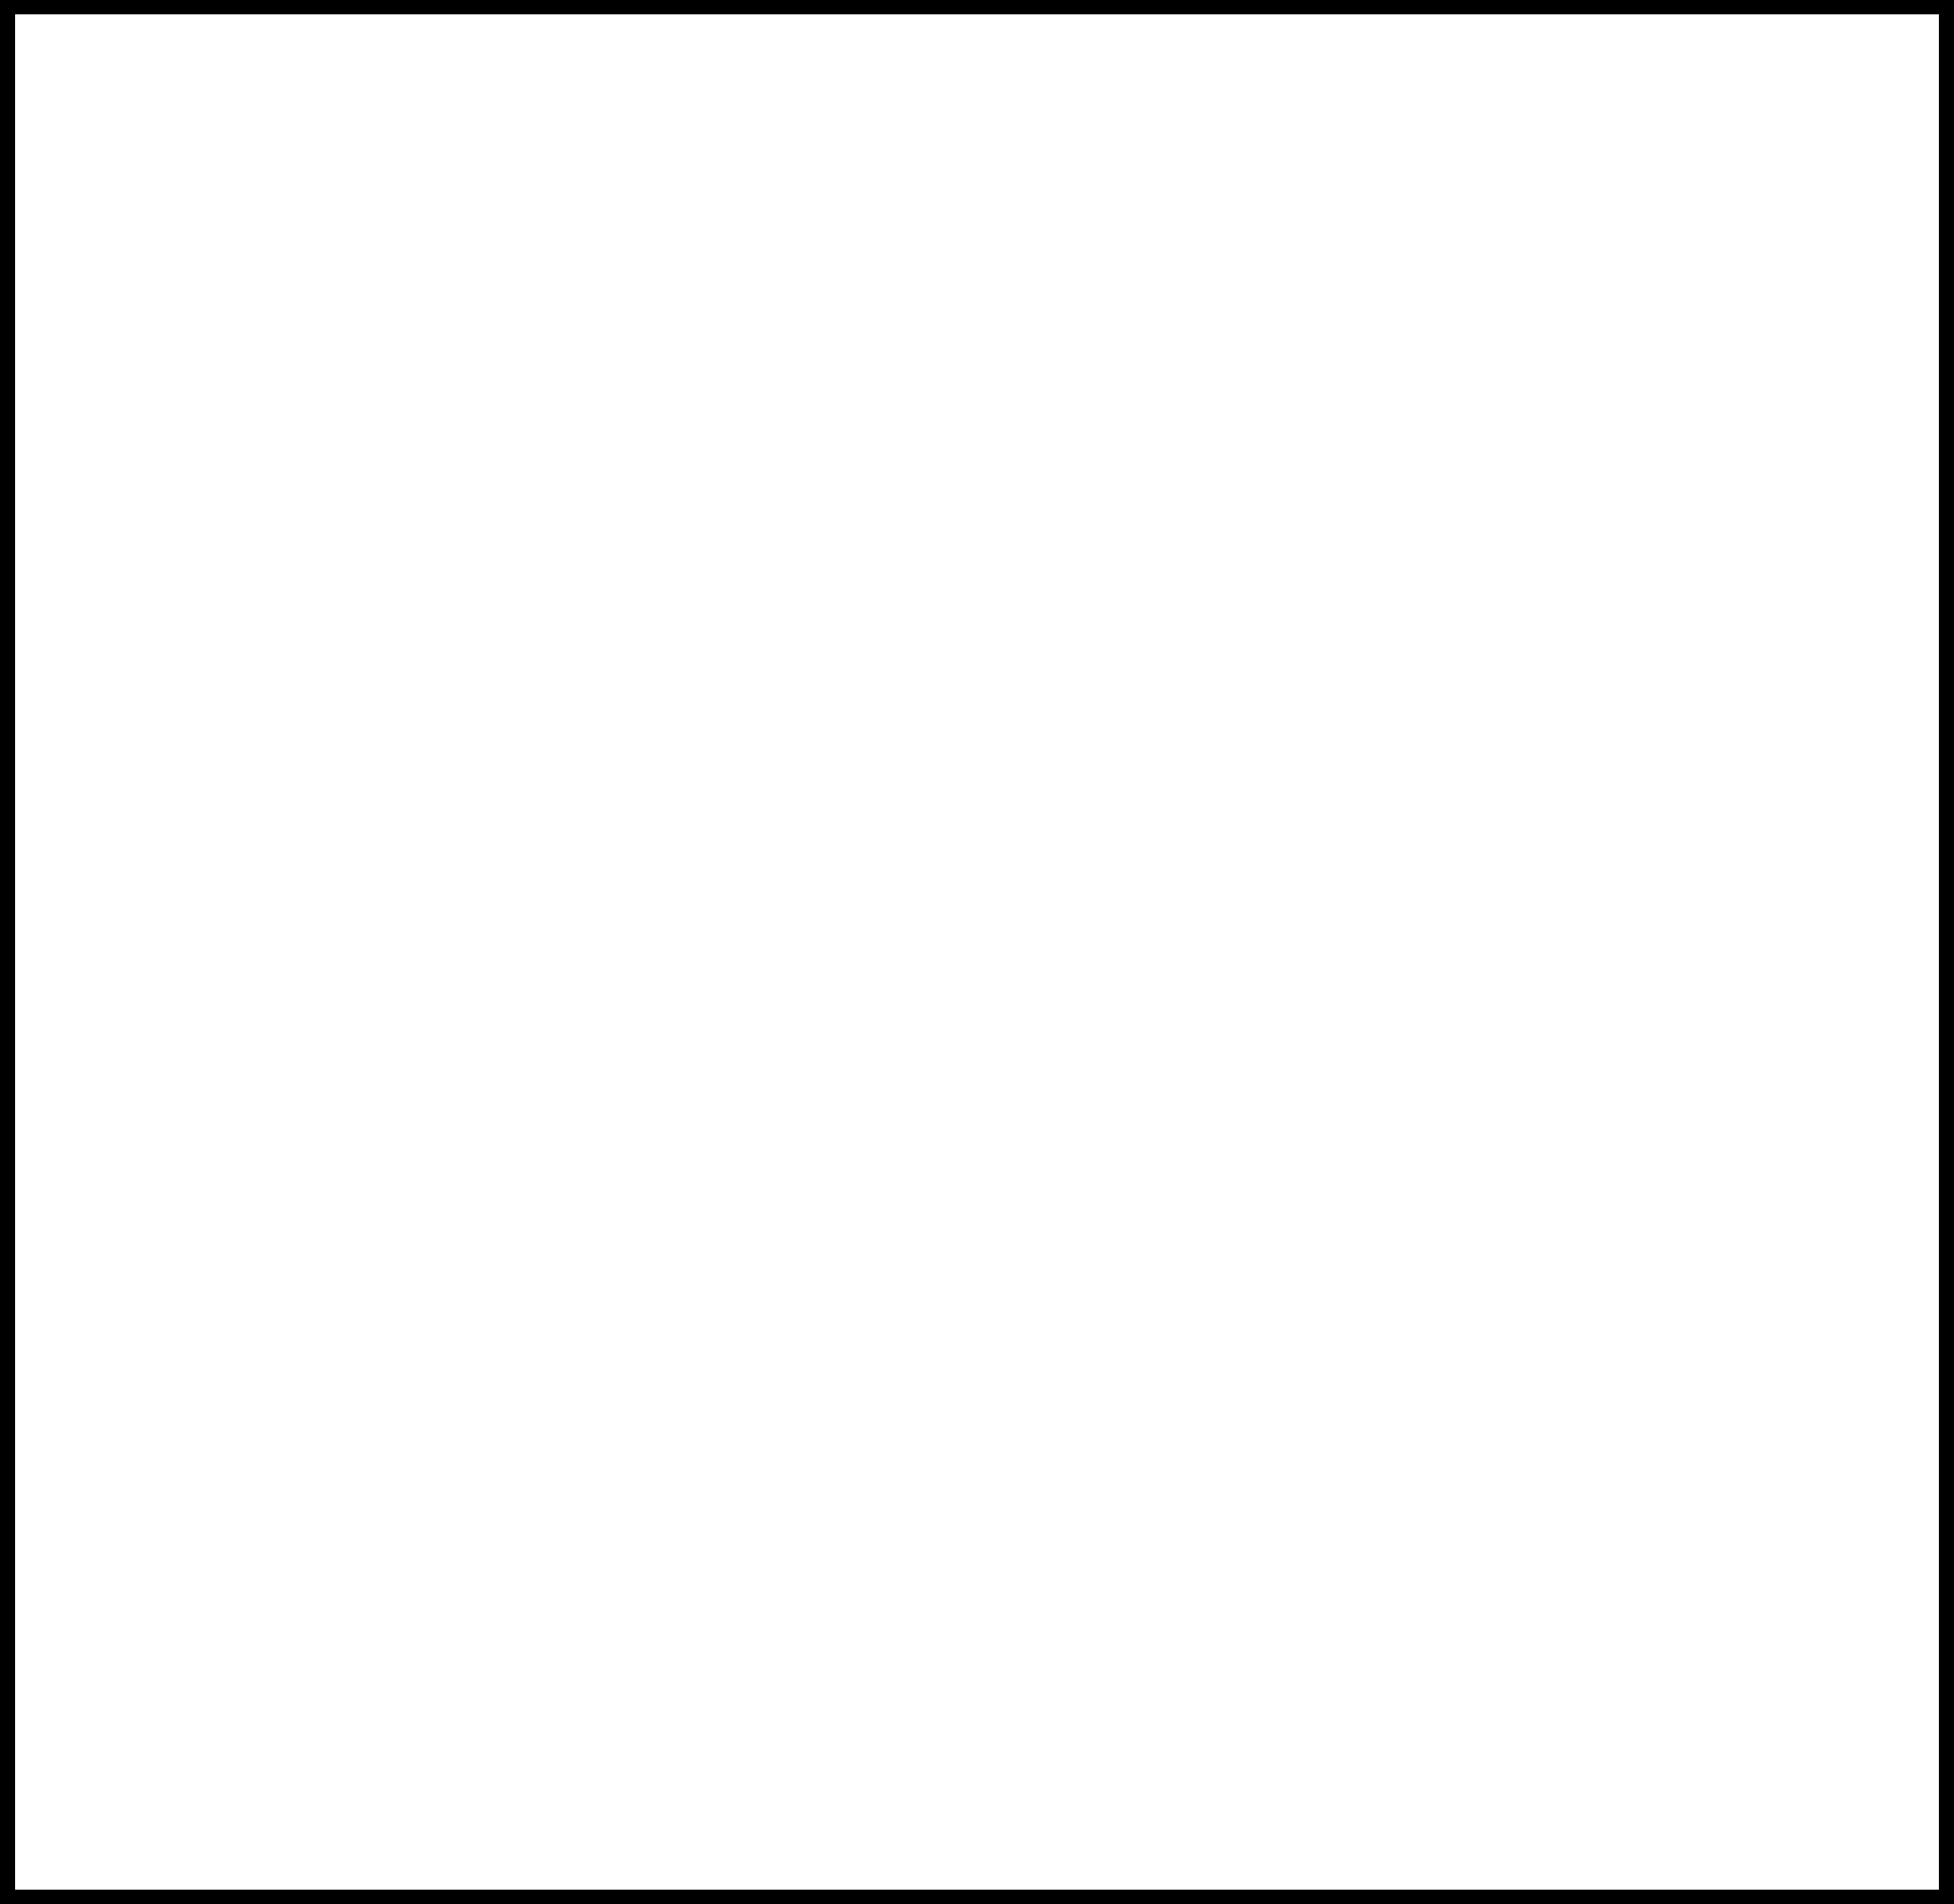 kb-monogram-vintage-stamp-light